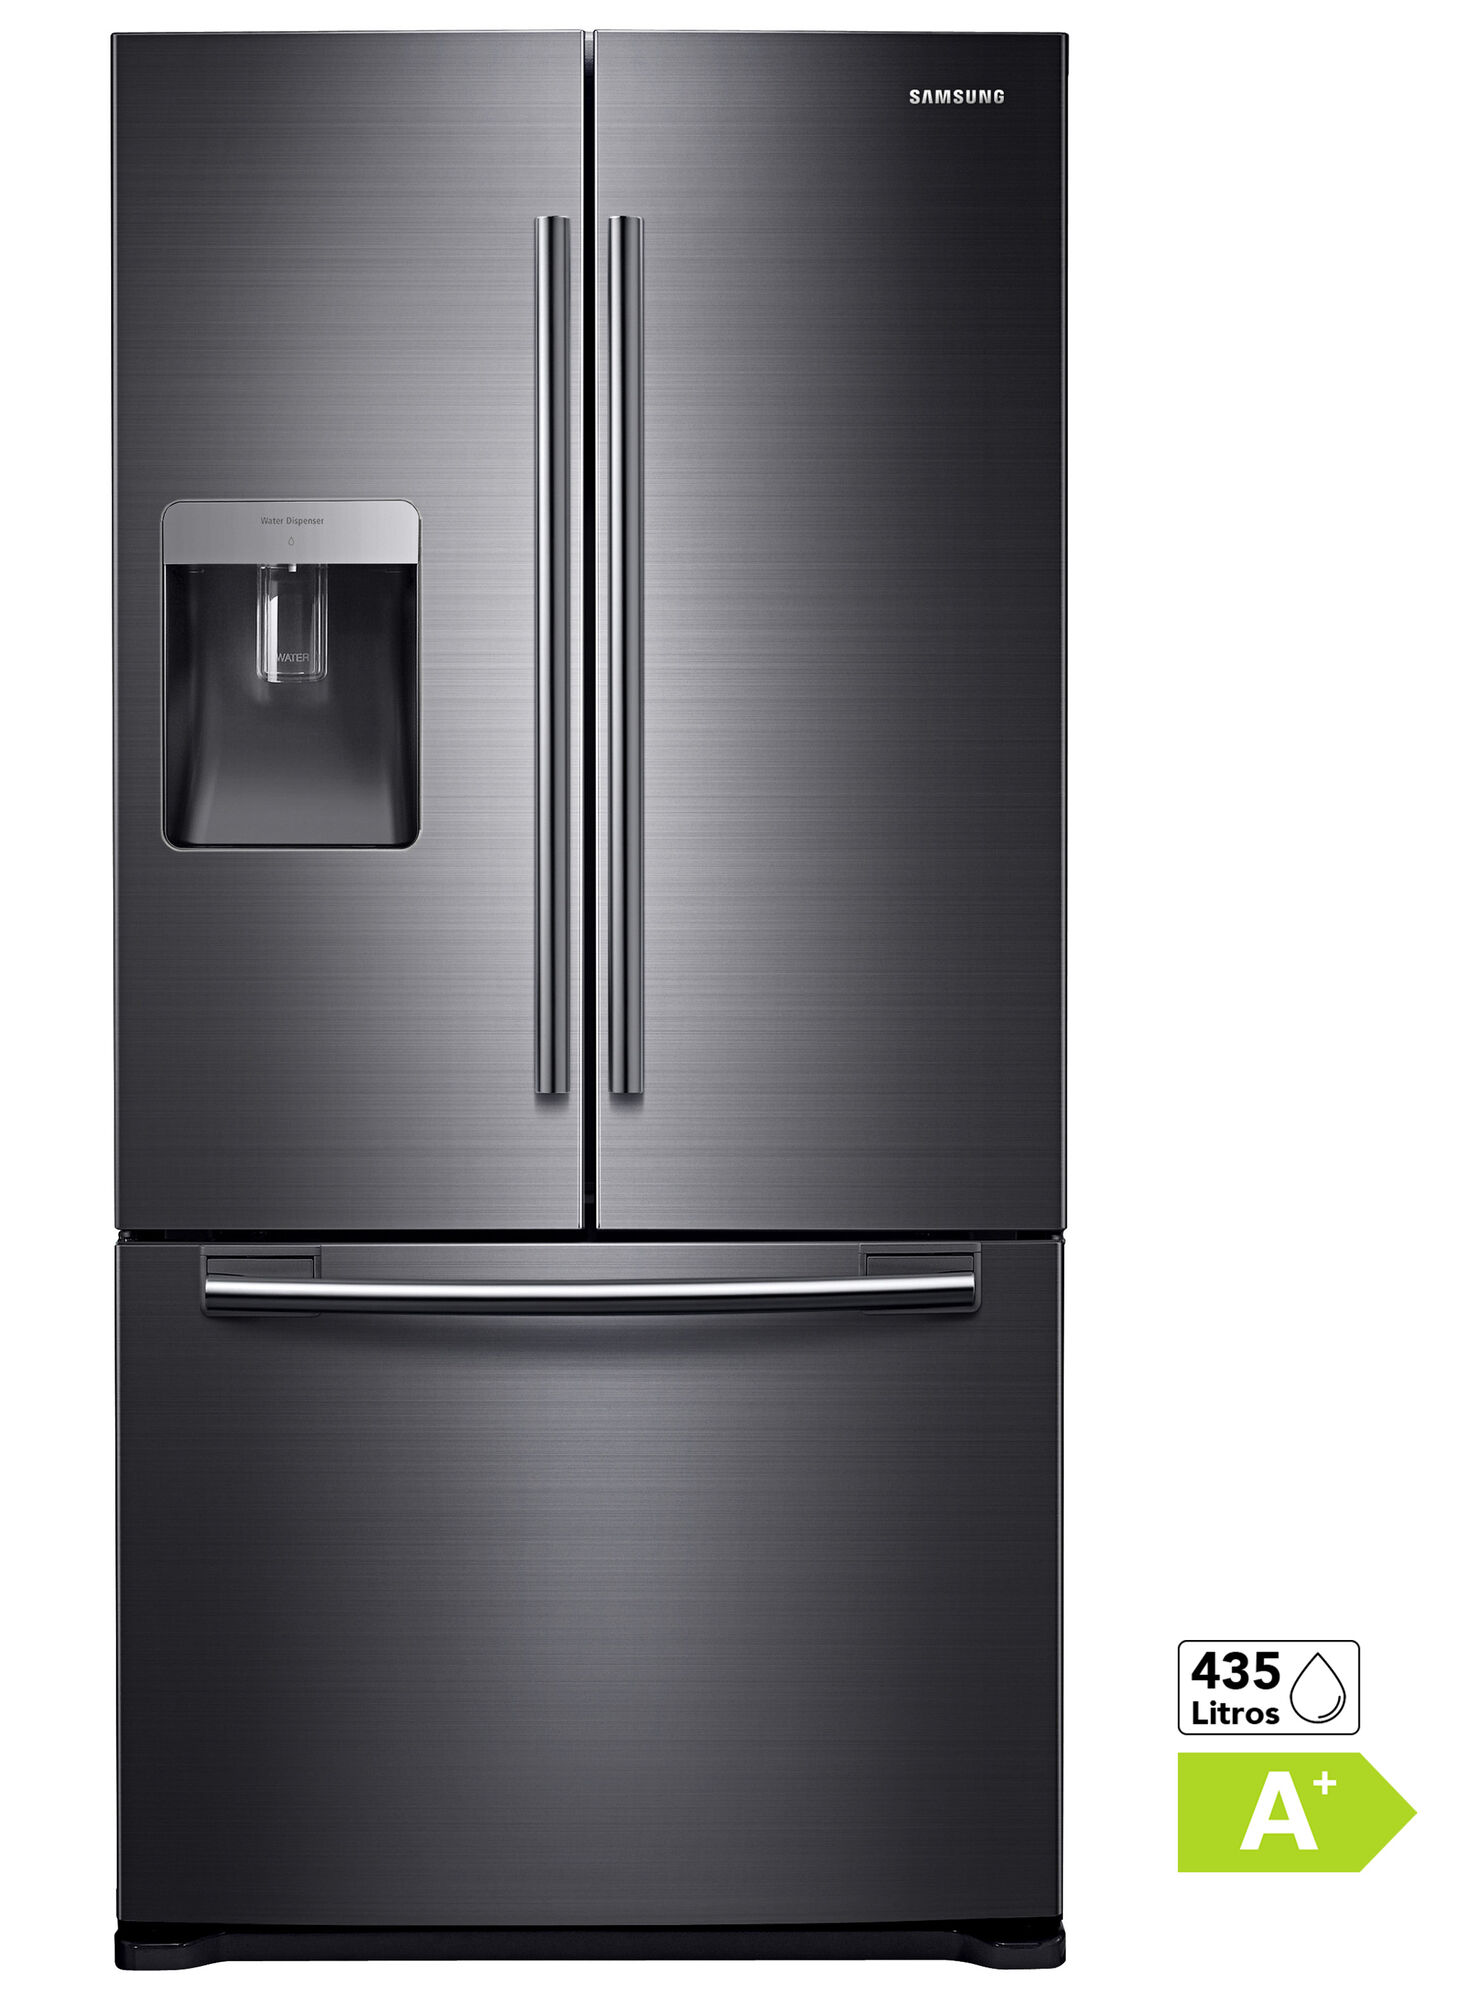 Refrigerador Samsung French Door No Frost 435 Lt